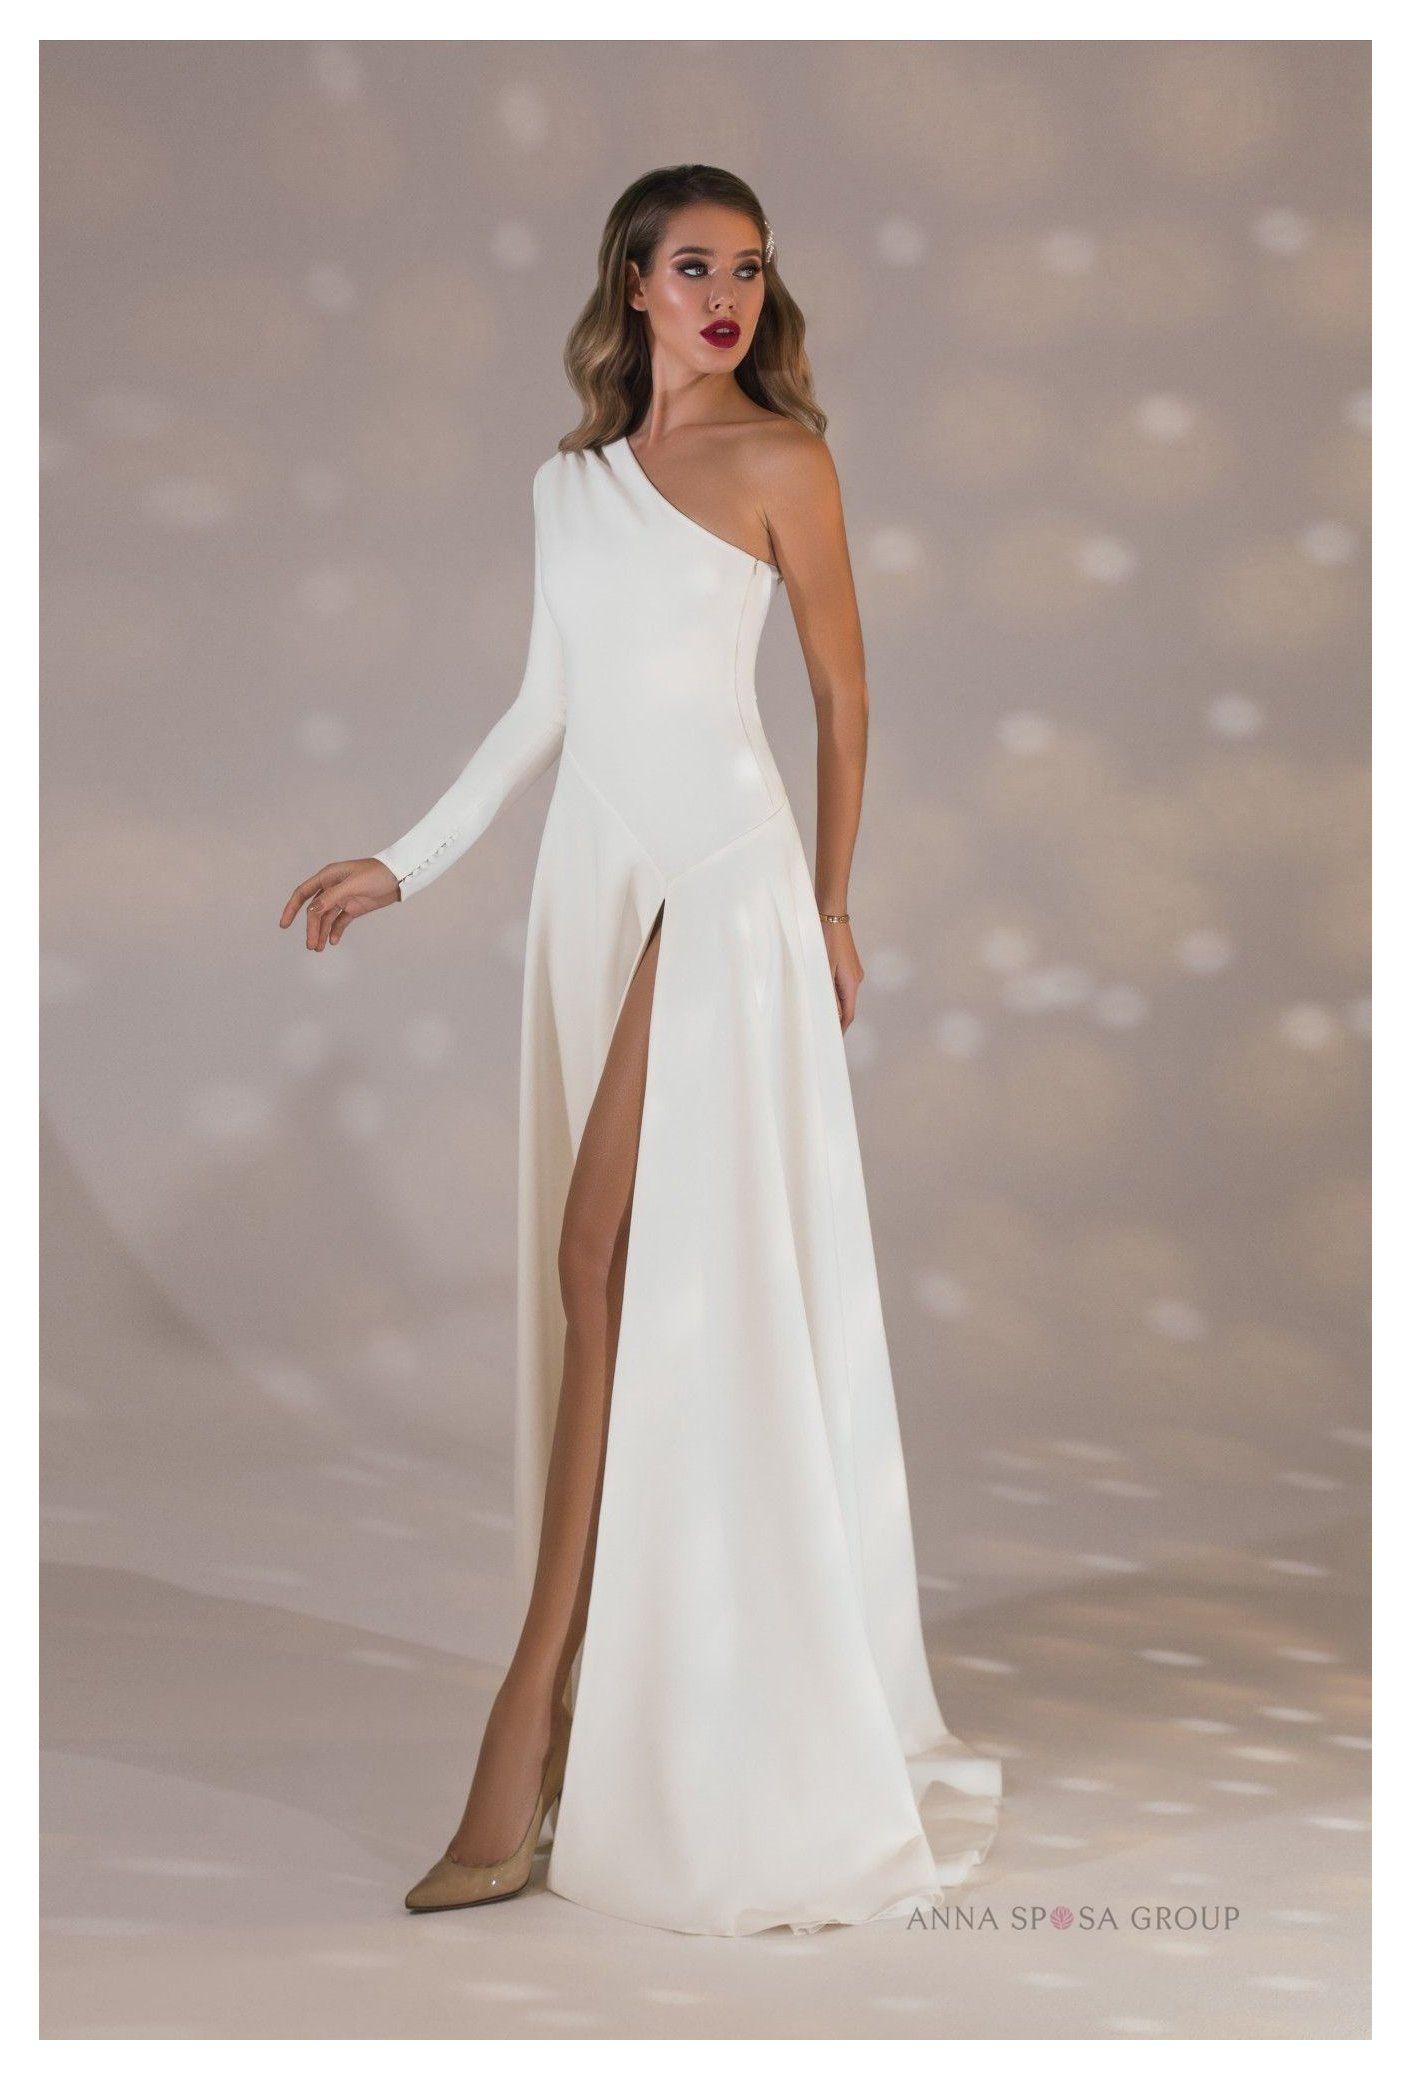 Wedding Dress Dilson By Brilanta Simple Elegant Wedding Dress Vintage Simpleelegantwedd Classy Wedding Dress Simple Elegant Wedding Dress Wedding Dresses [ 2080 x 1411 Pixel ]